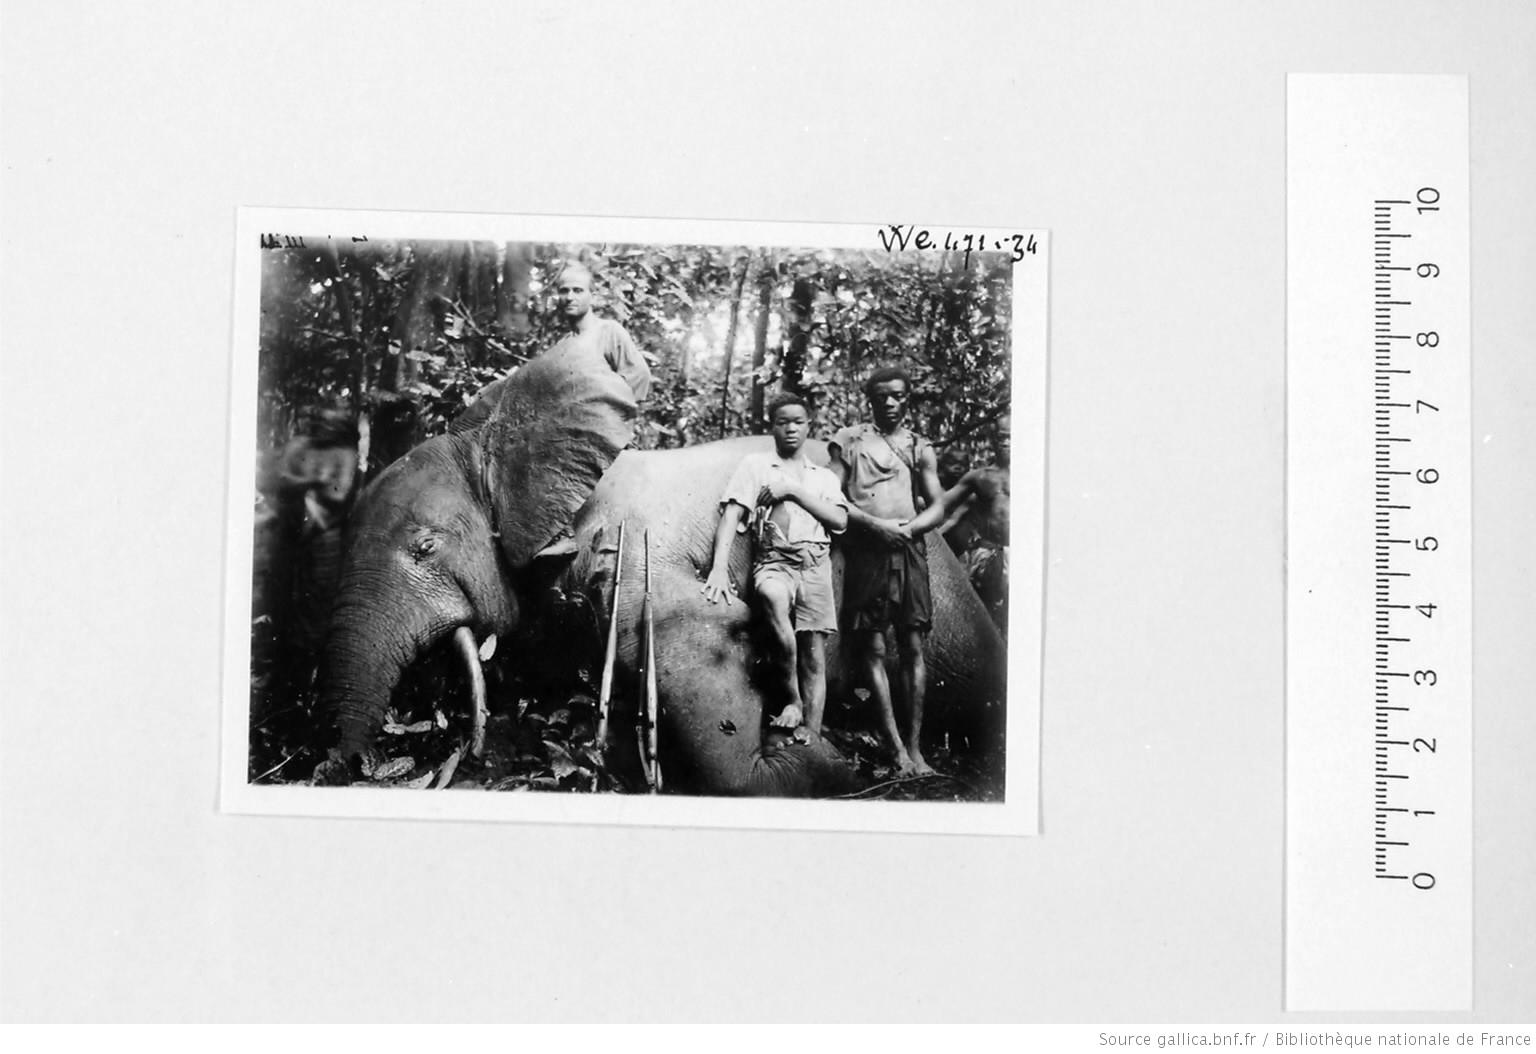 [39 phot. d'A.E.F. en 1924. Enregistré en 1936] - 32